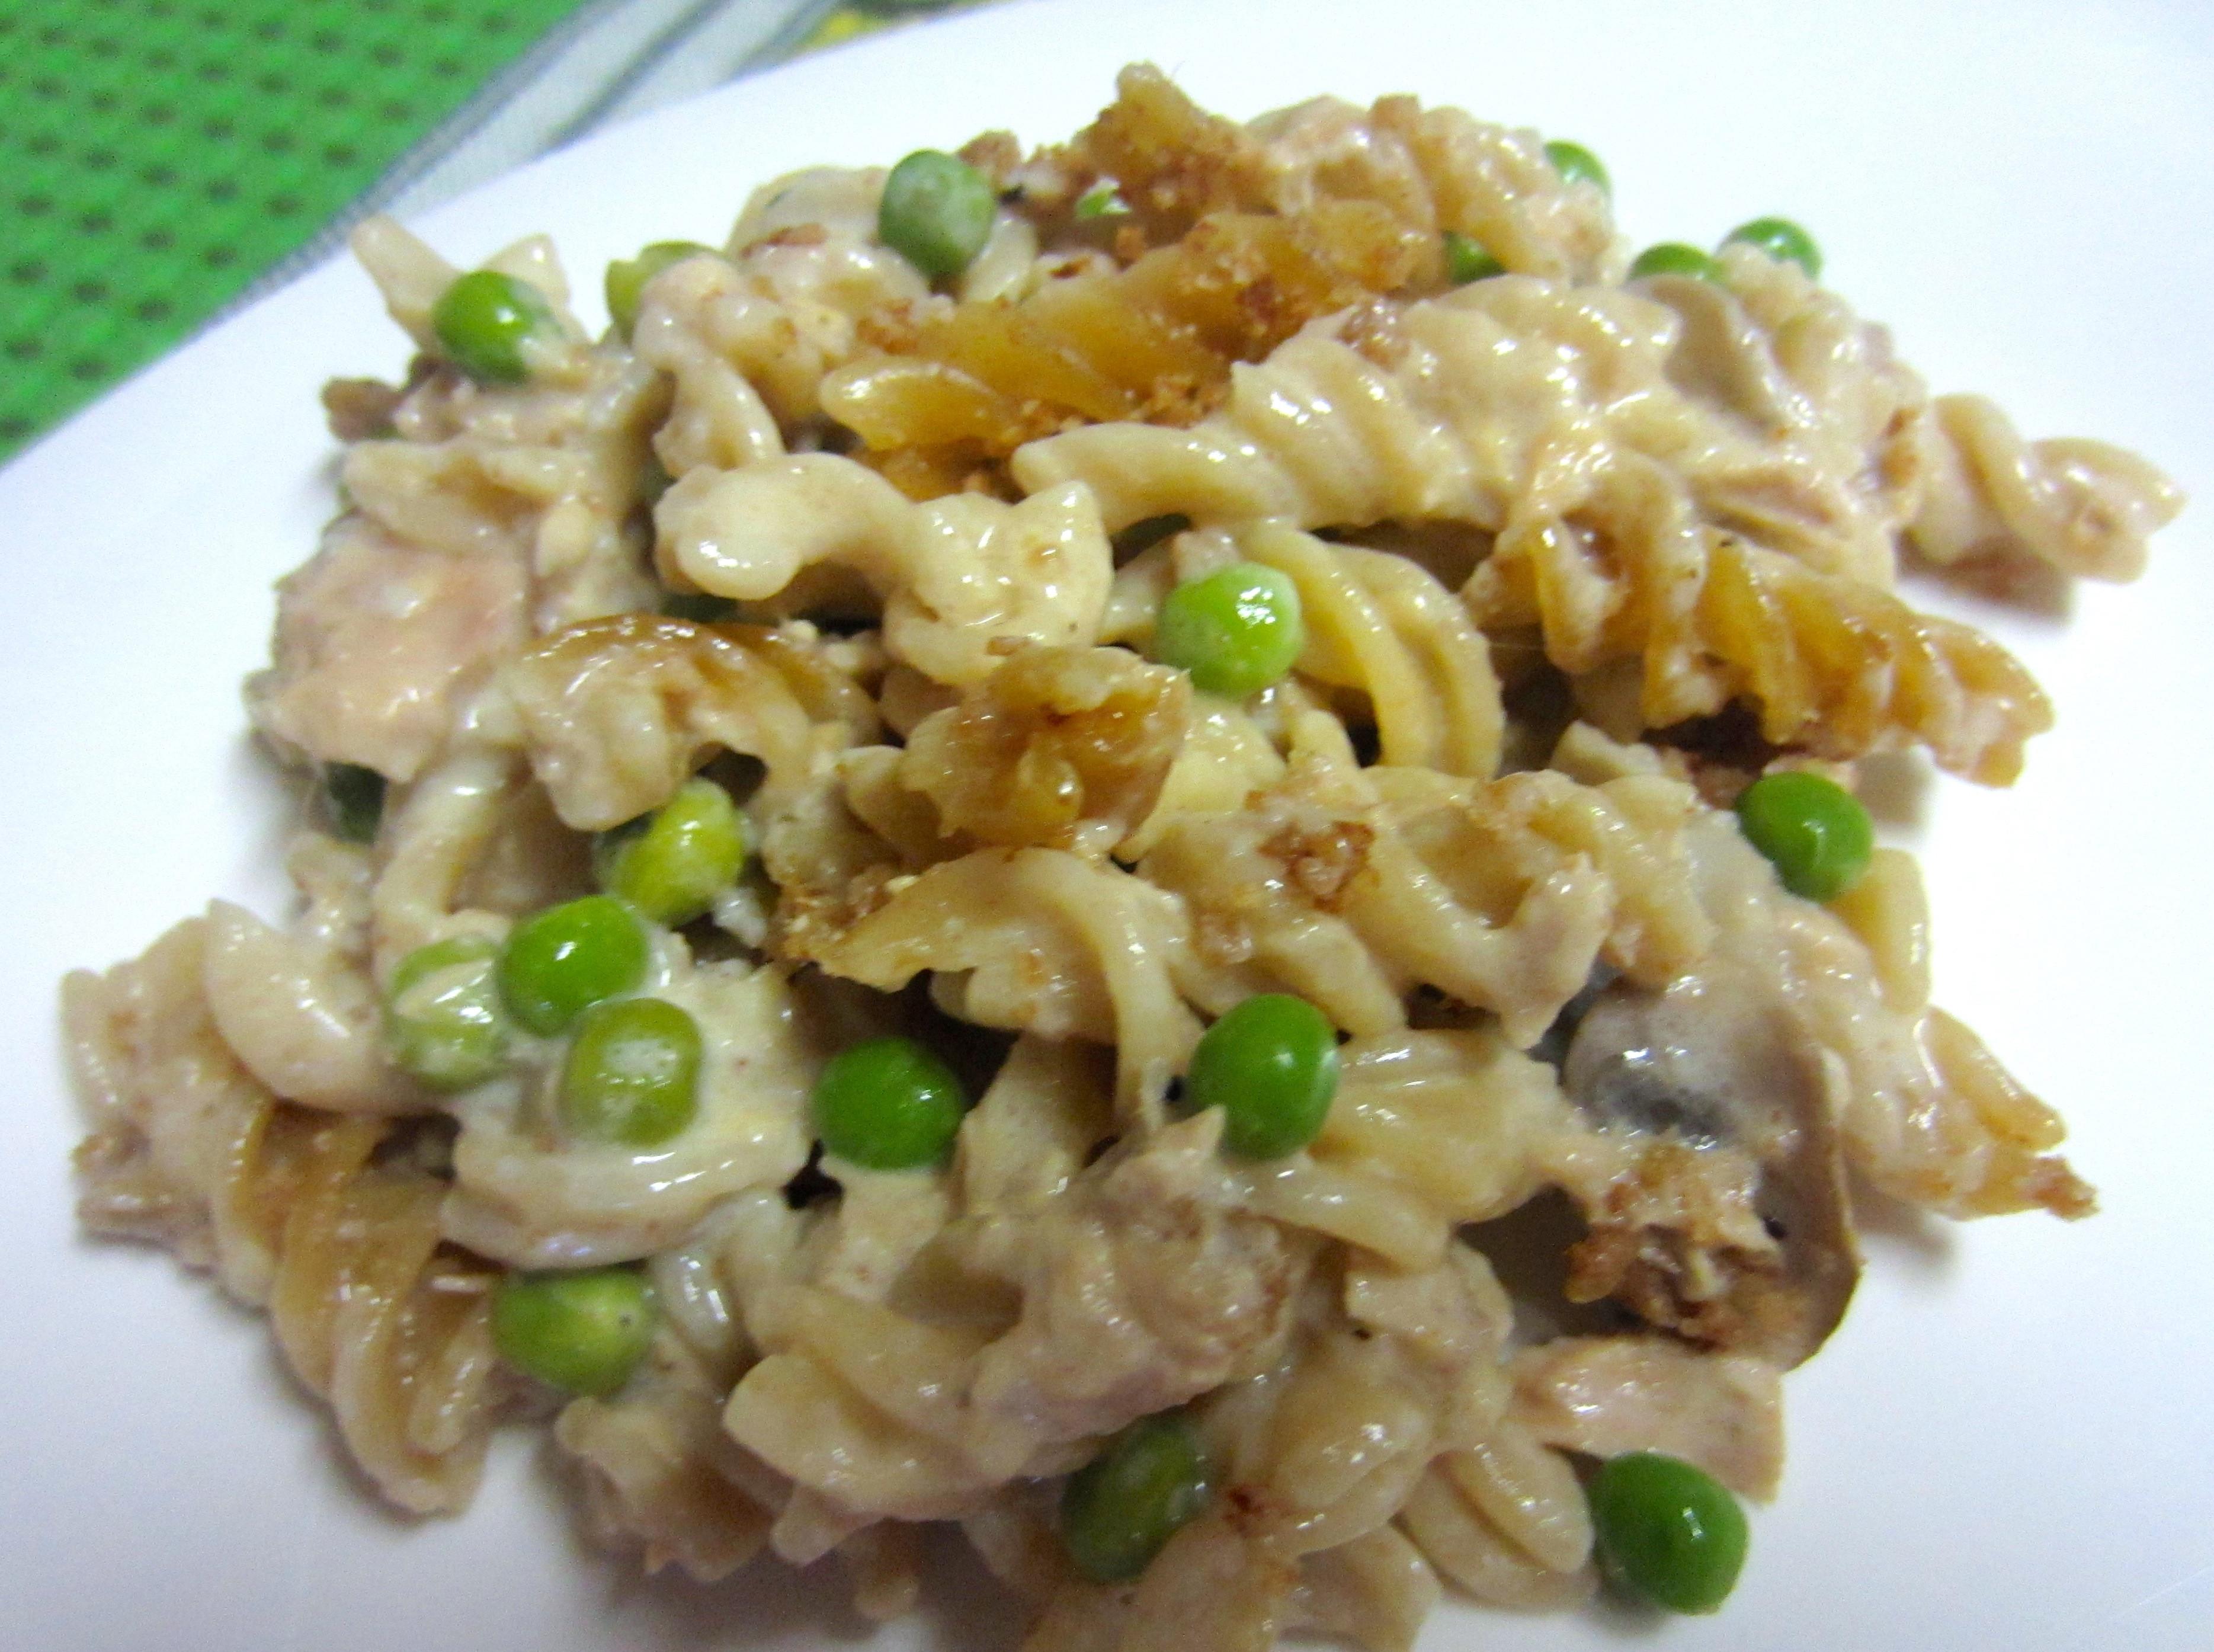 Tuna Casserole Recipe Healthy  Healthy Tuna Casserole 2